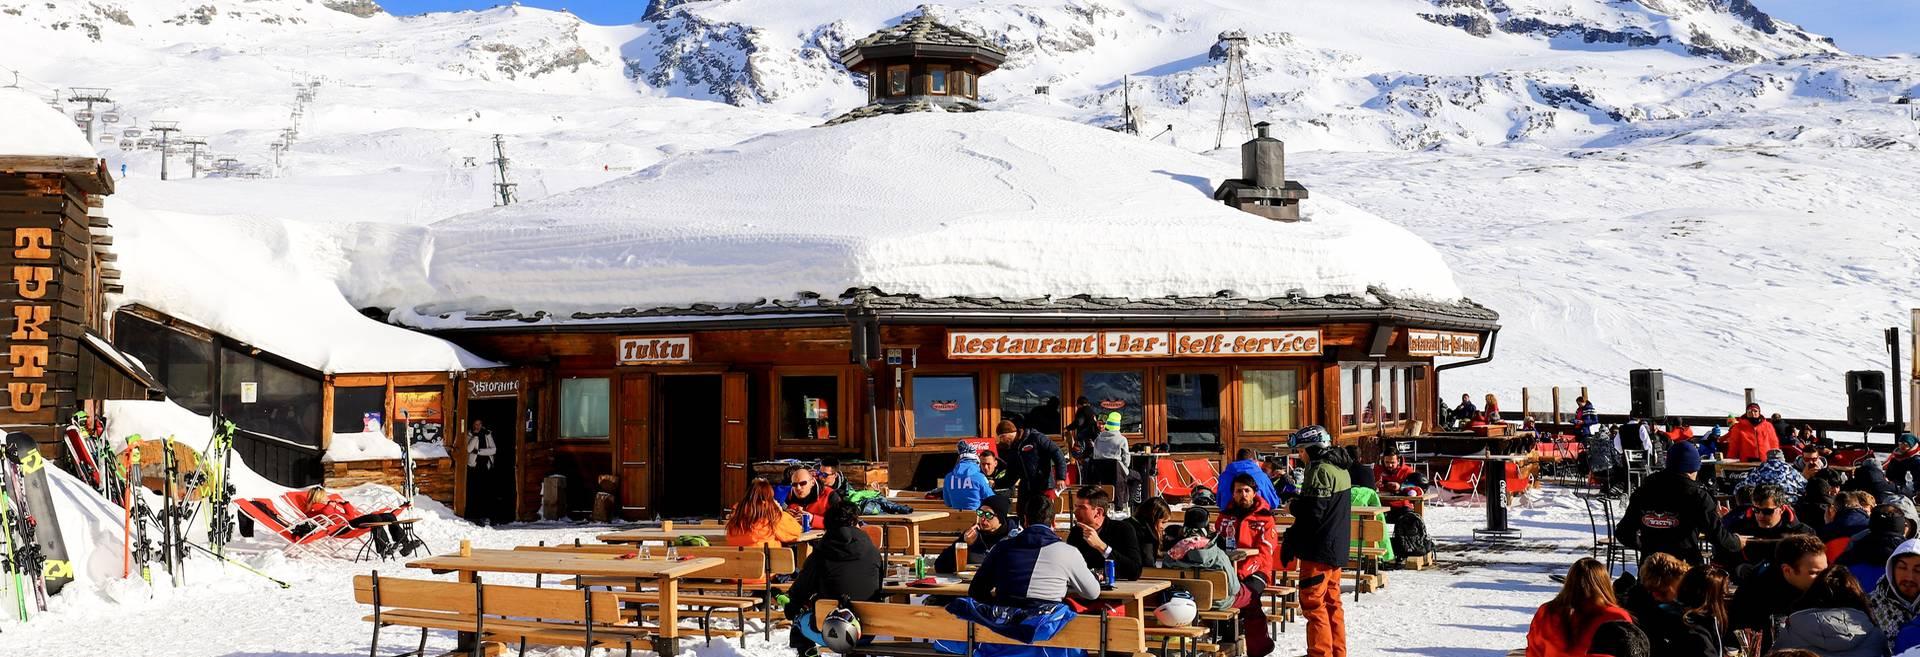 3 Stars Hotel Cervinia On The Ski Slopes Plan Maison Aosta Valley